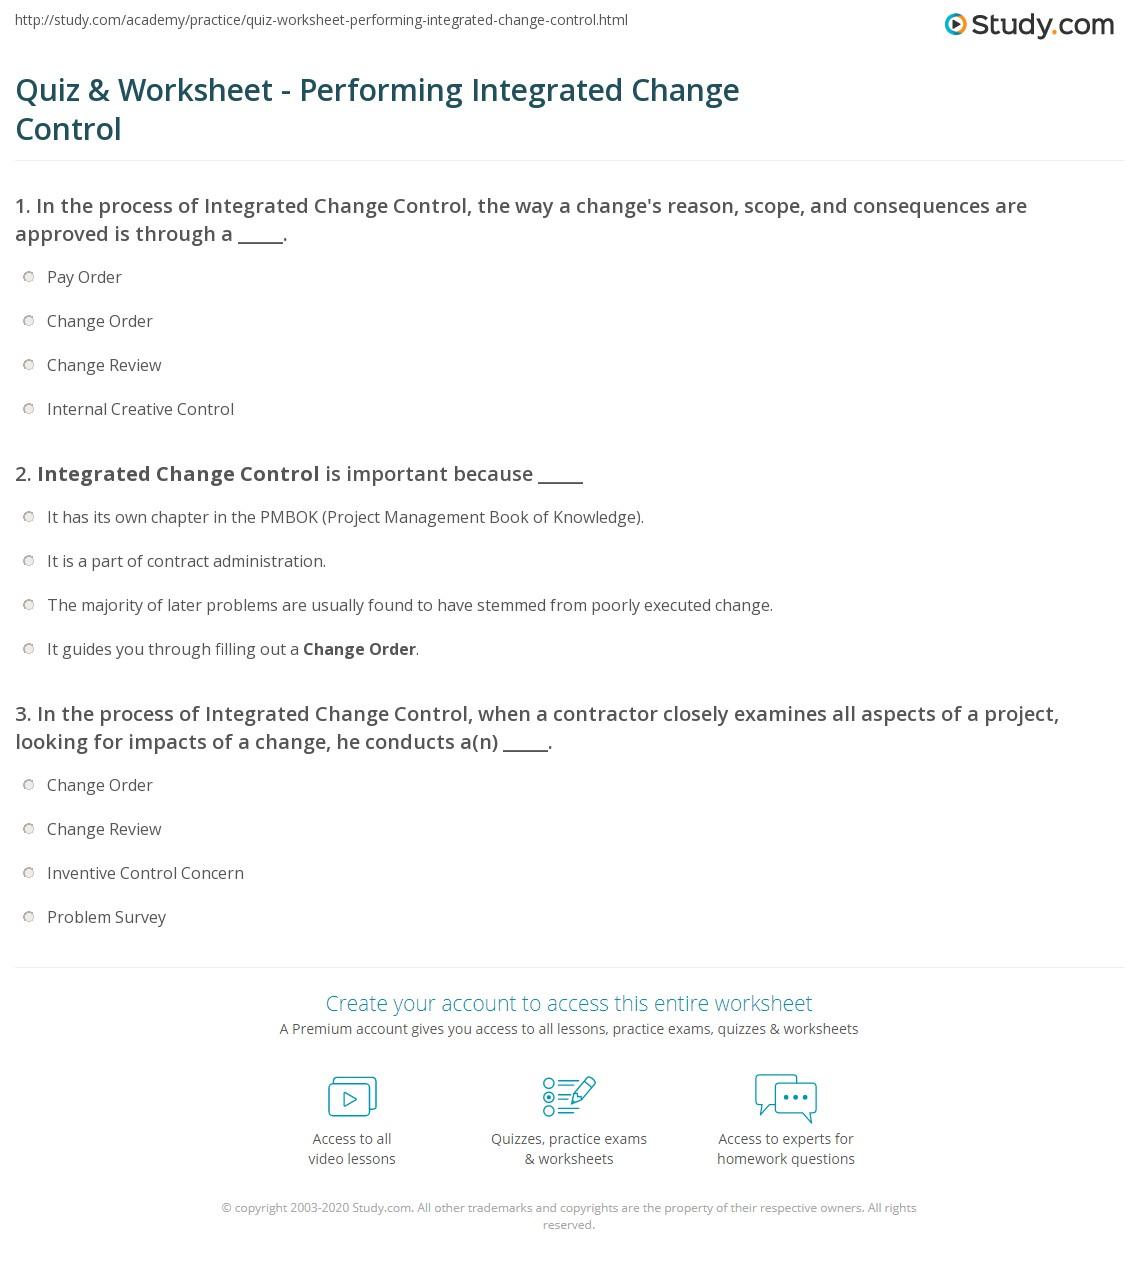 Quiz & Worksheet - Performing Integrated Change Control | Study.com